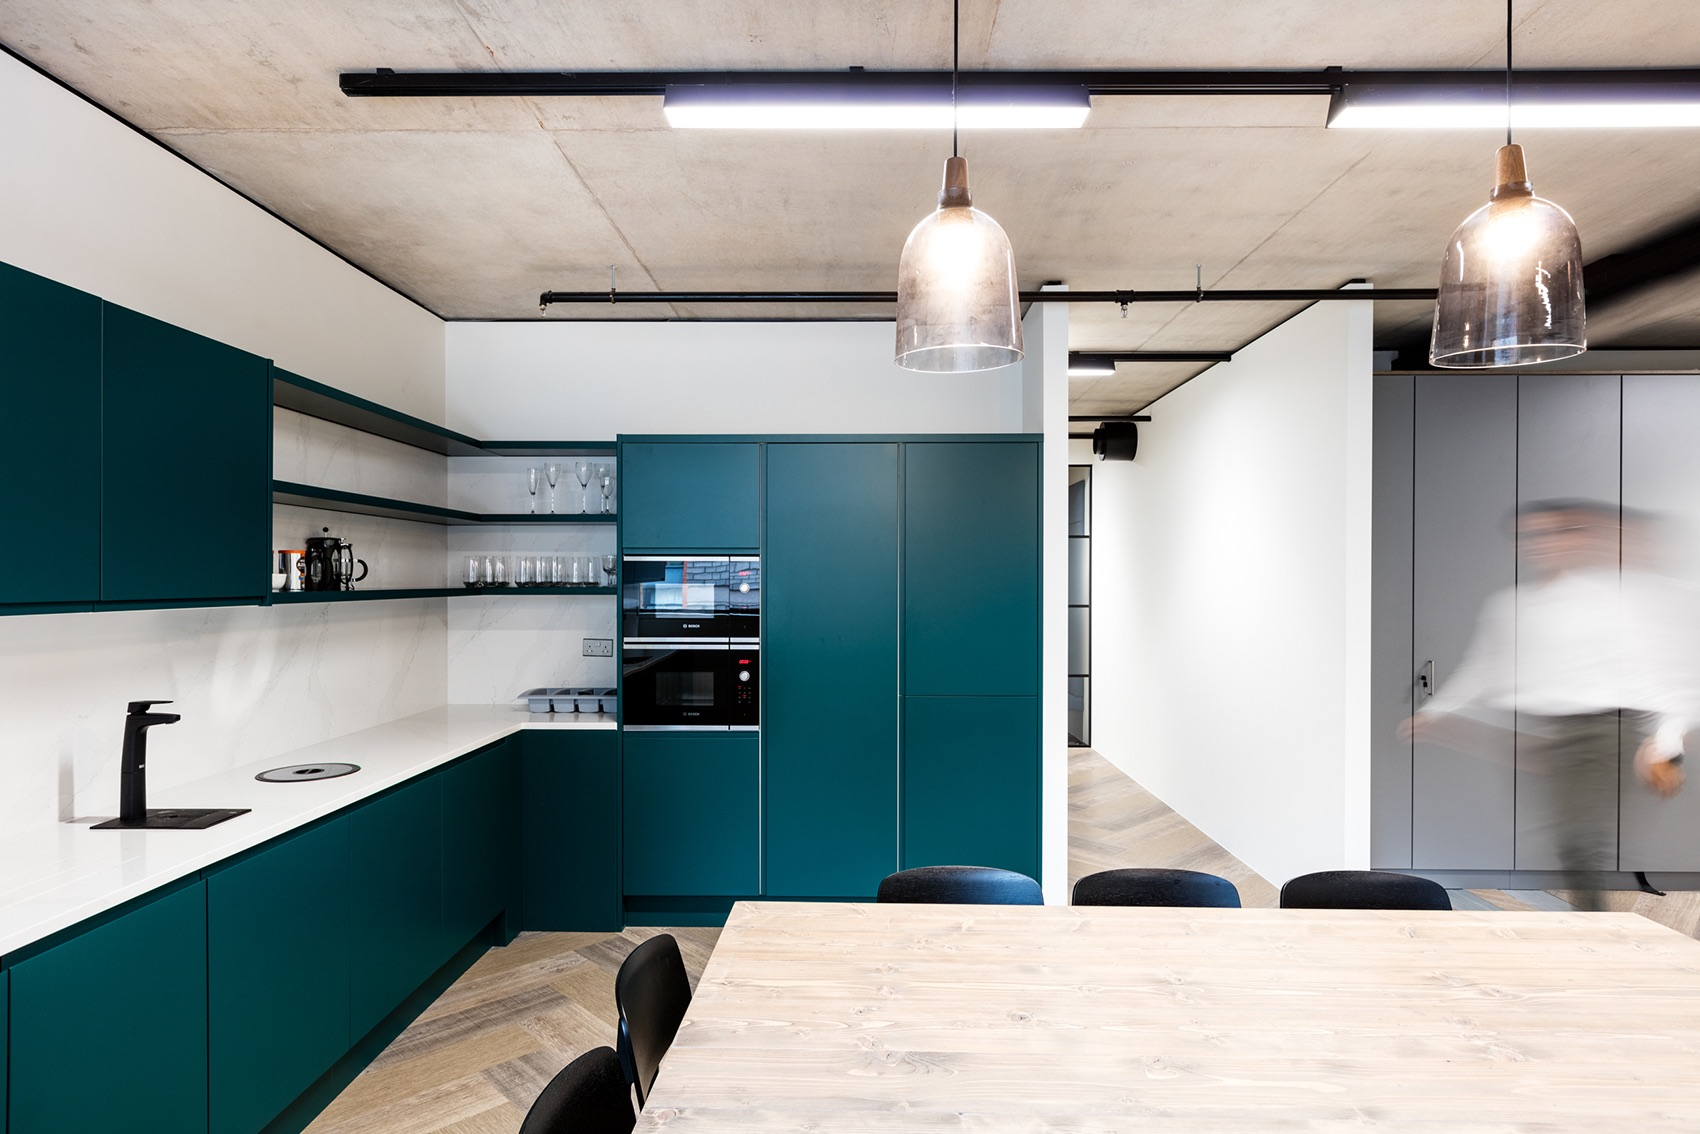 albion-capital-london-office-6